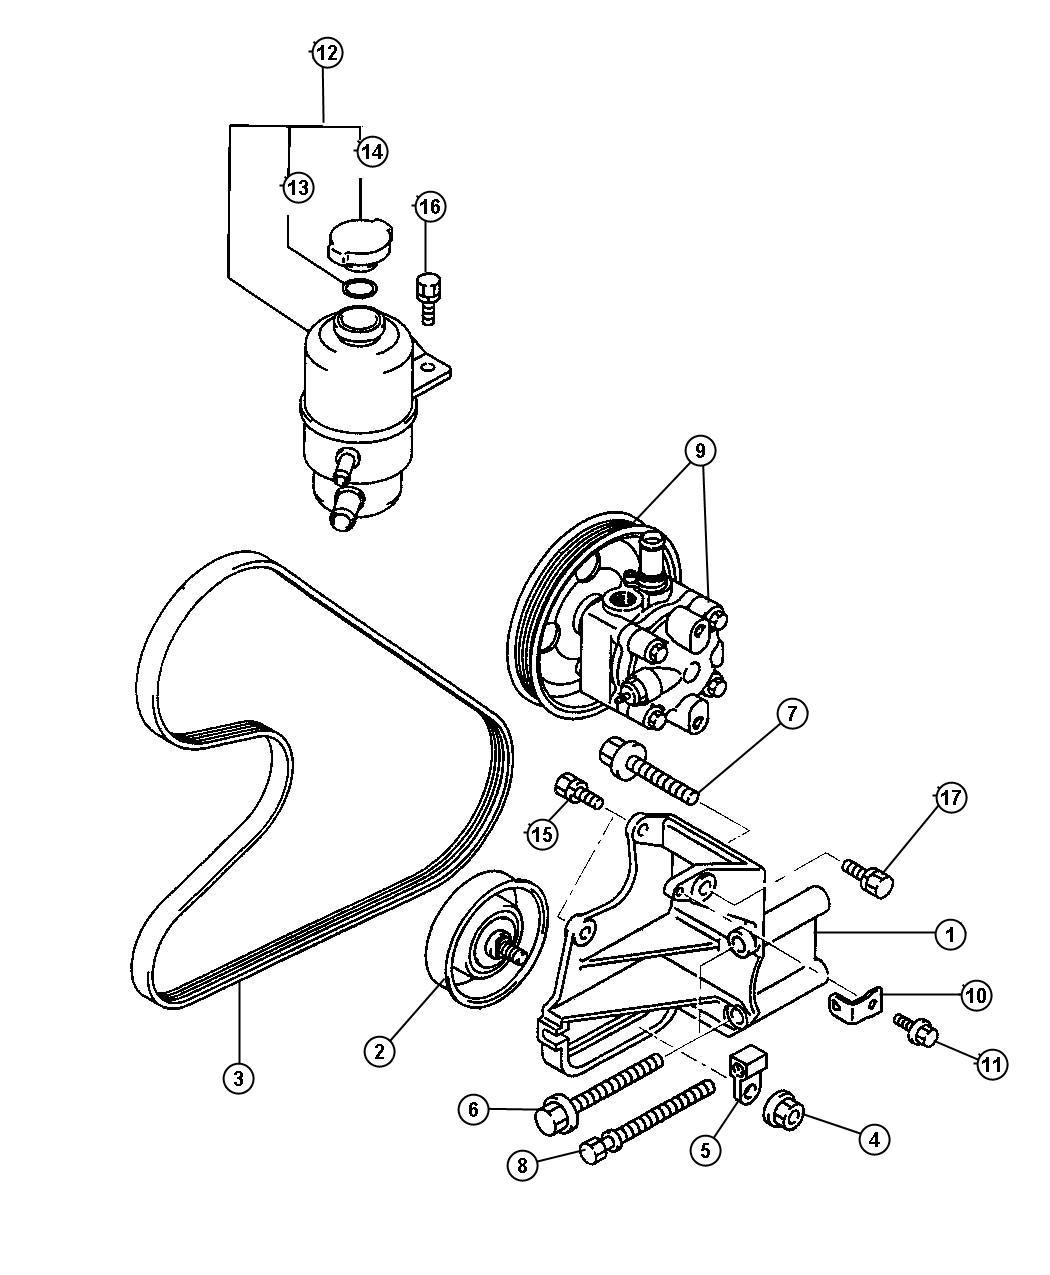 2004 Dodge Stratus Sxt 2 4l 4 Cyl A  T Belt  Power Steering